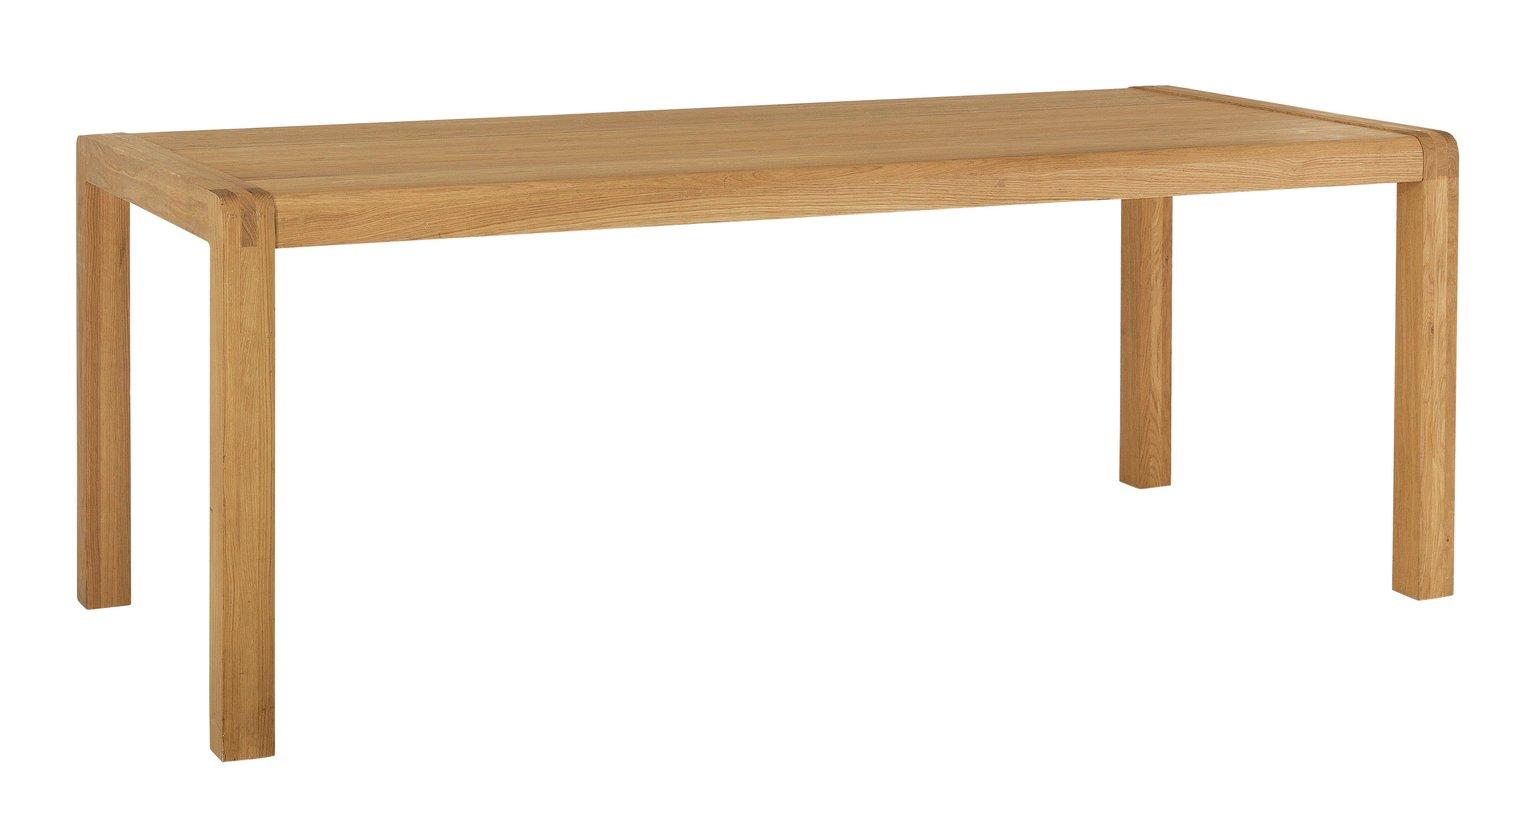 Habitat Radius Solid Oak 8 Seater Dining Table